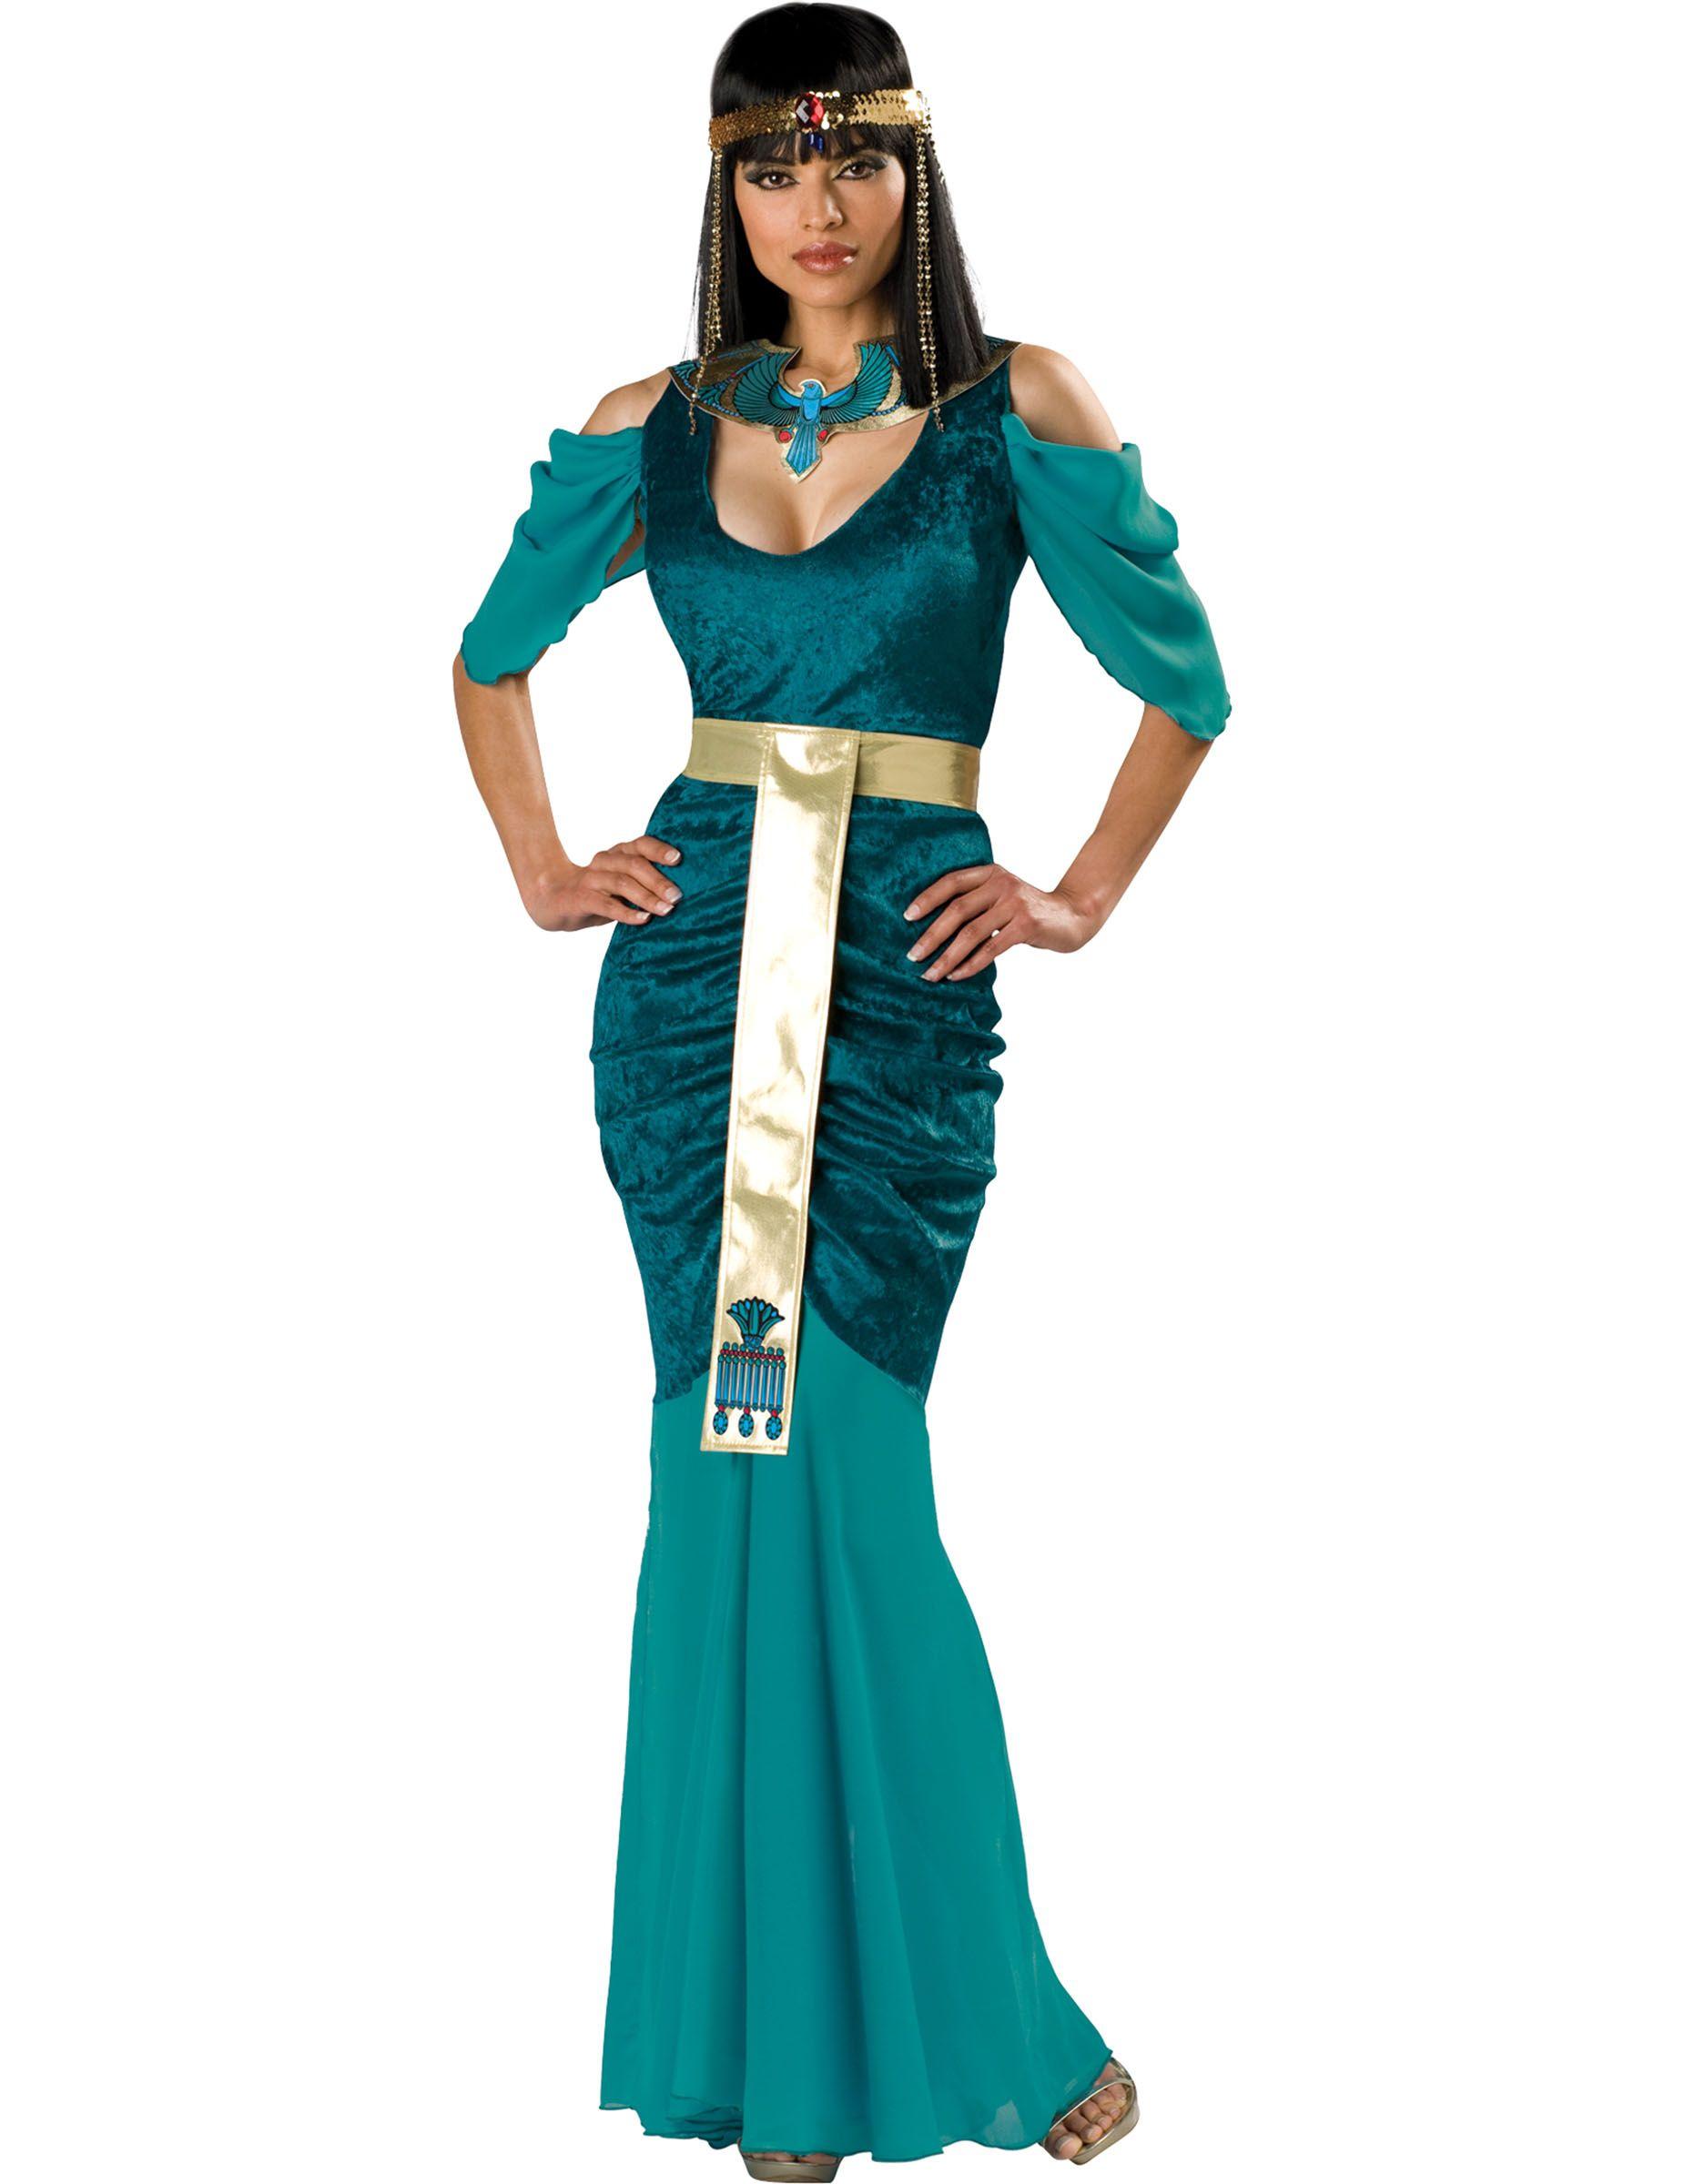 Disfraz egipcia mujer Premium | Disfraz egipcia, Disfraces para ...